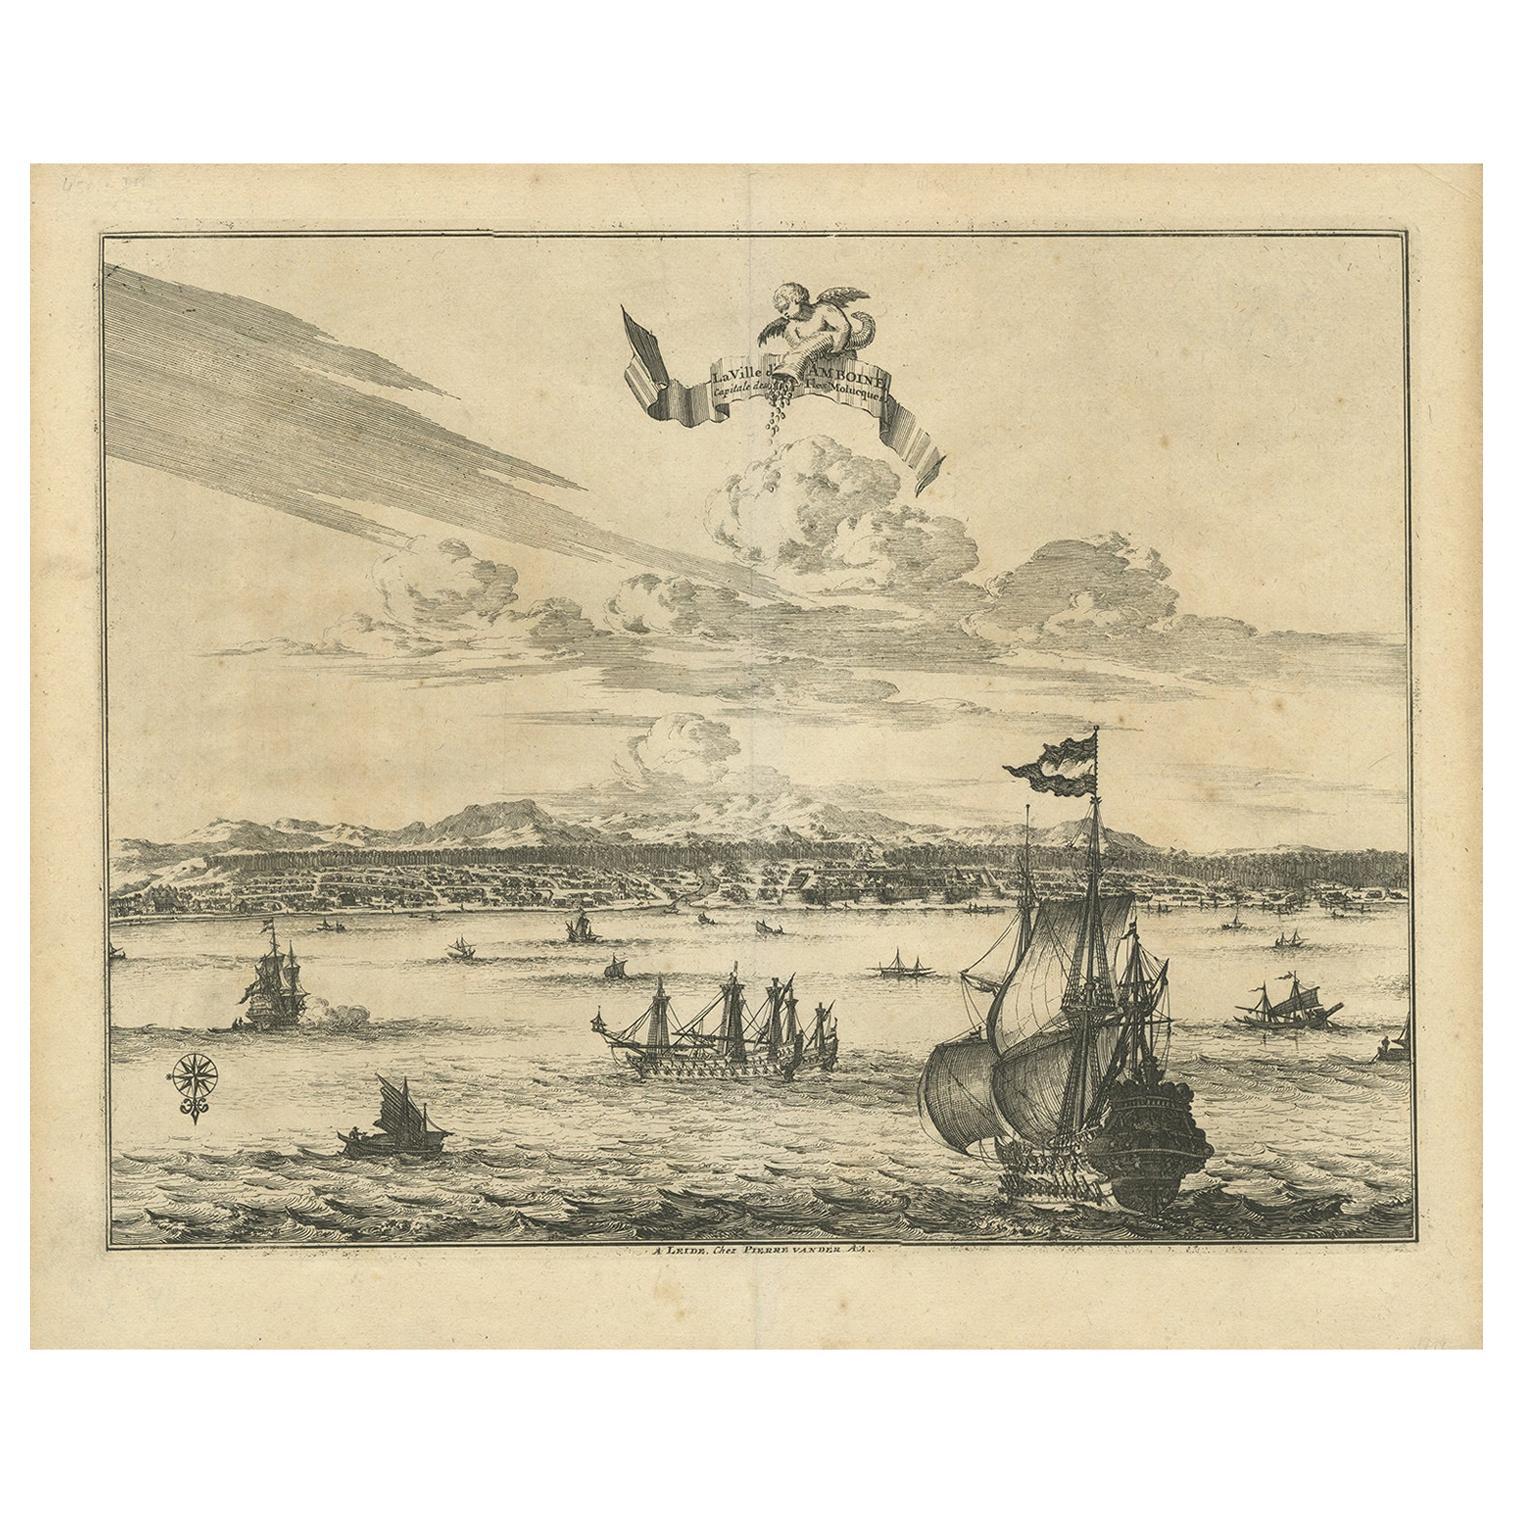 Antique Print of Amboina by Van der Aa, circa 1725